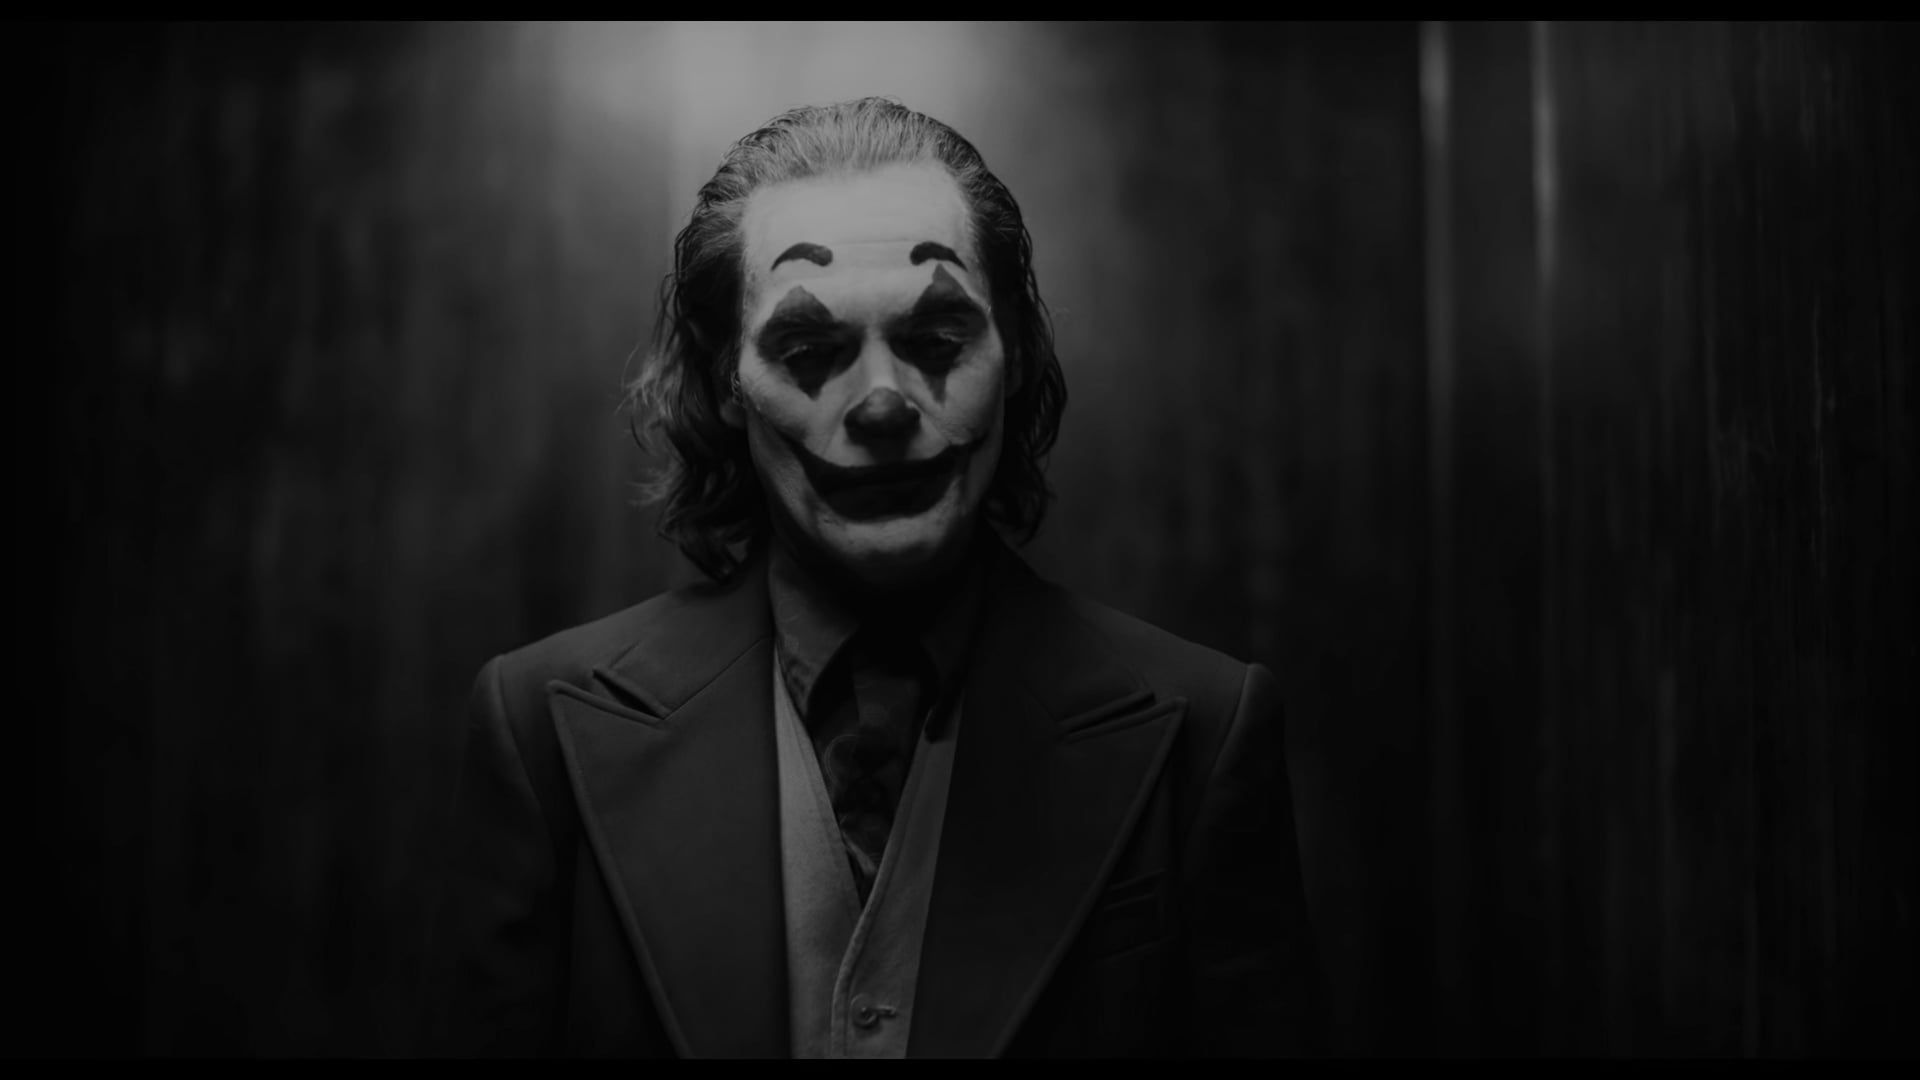 Joaquin Phoenix Joker Monochrome 1080p Wallpaper Hdwallpaper Desktop Joaquin Joaquin Phoenix Monochrome